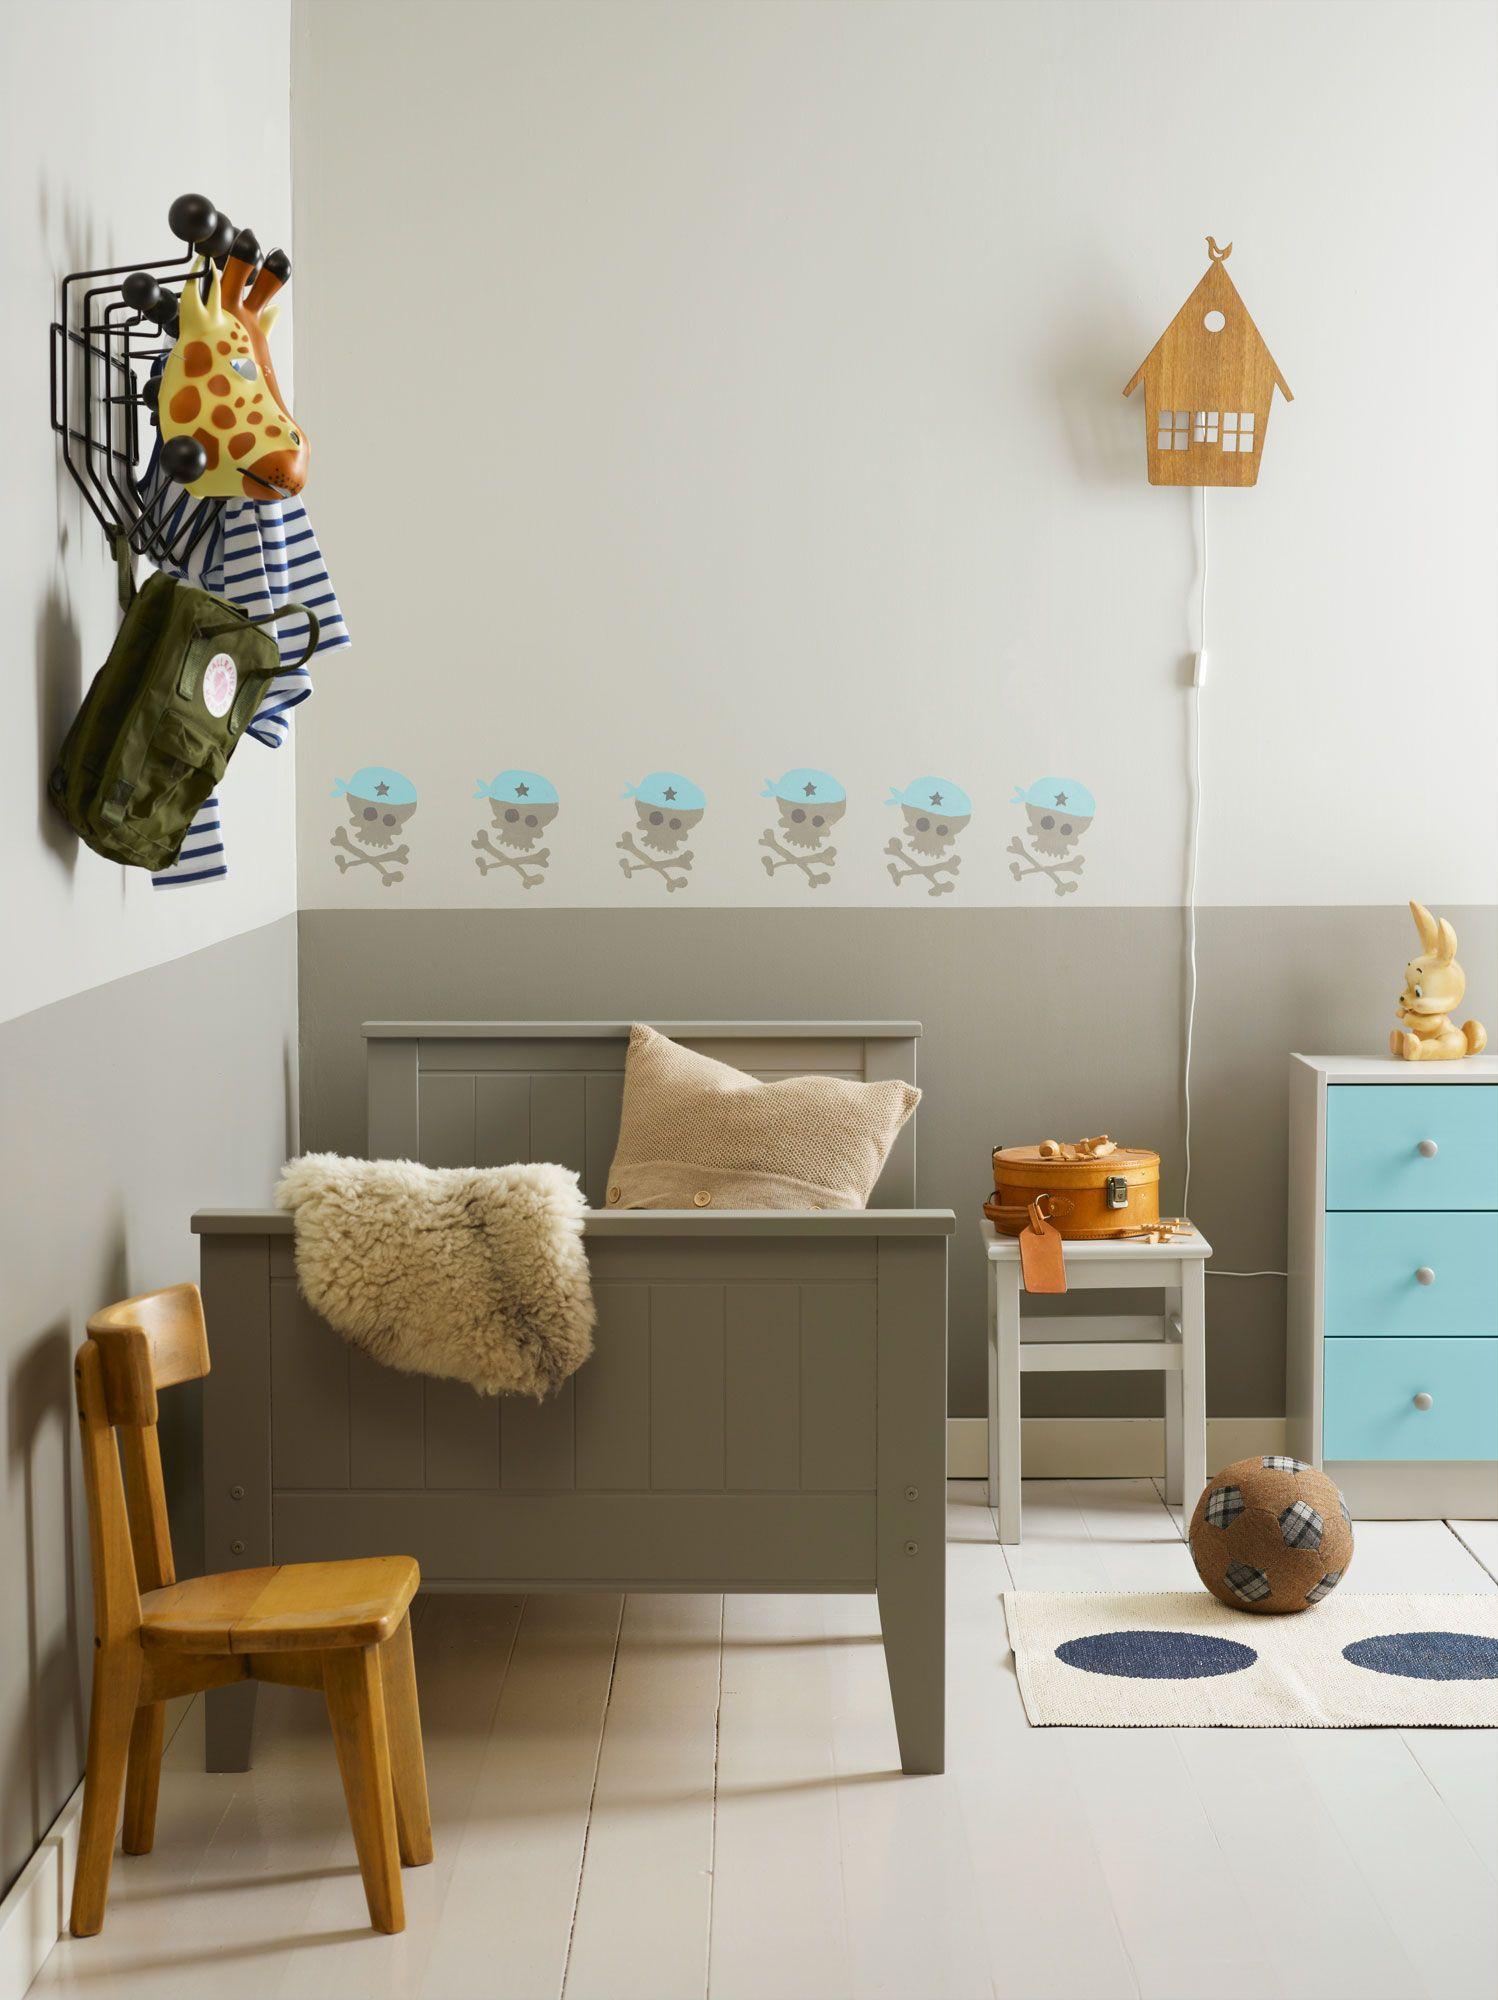 C mo pintar una habitaci n infantil hogarmania - Simulador pintar habitacion ...